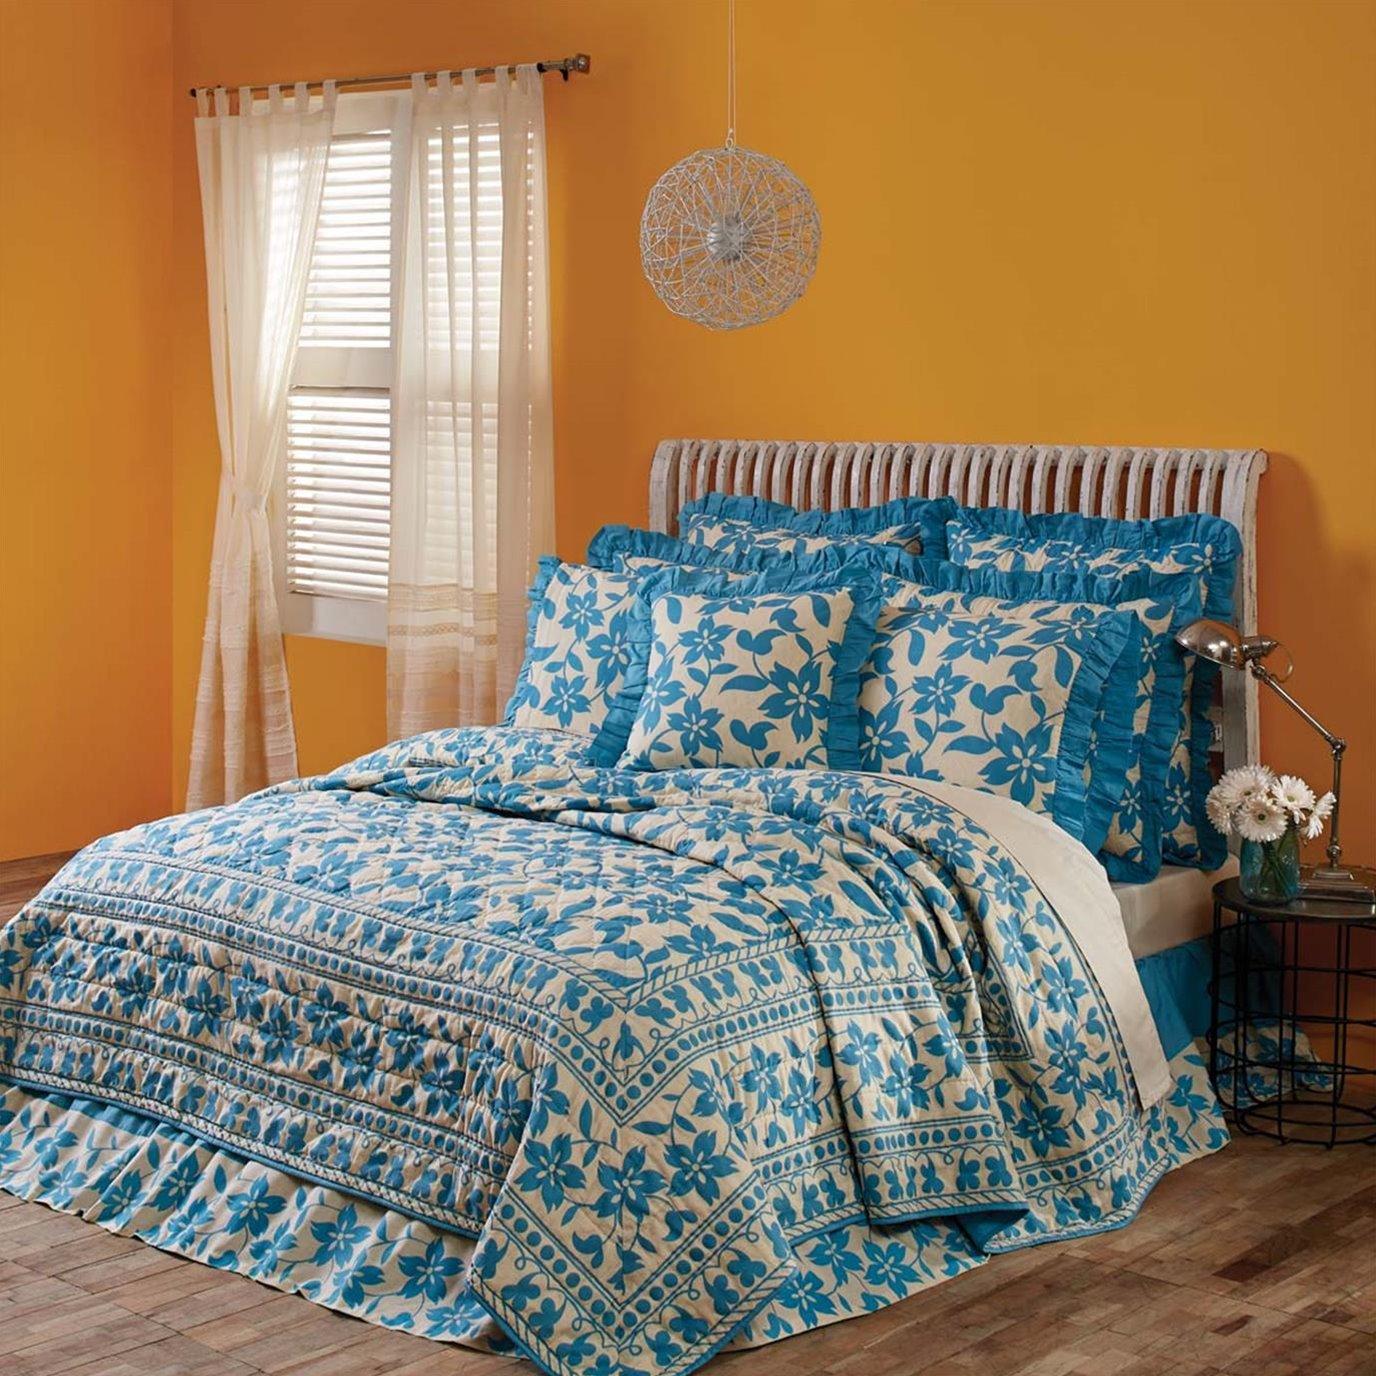 Briar Azure Luxury King Quilt 120Wx105L